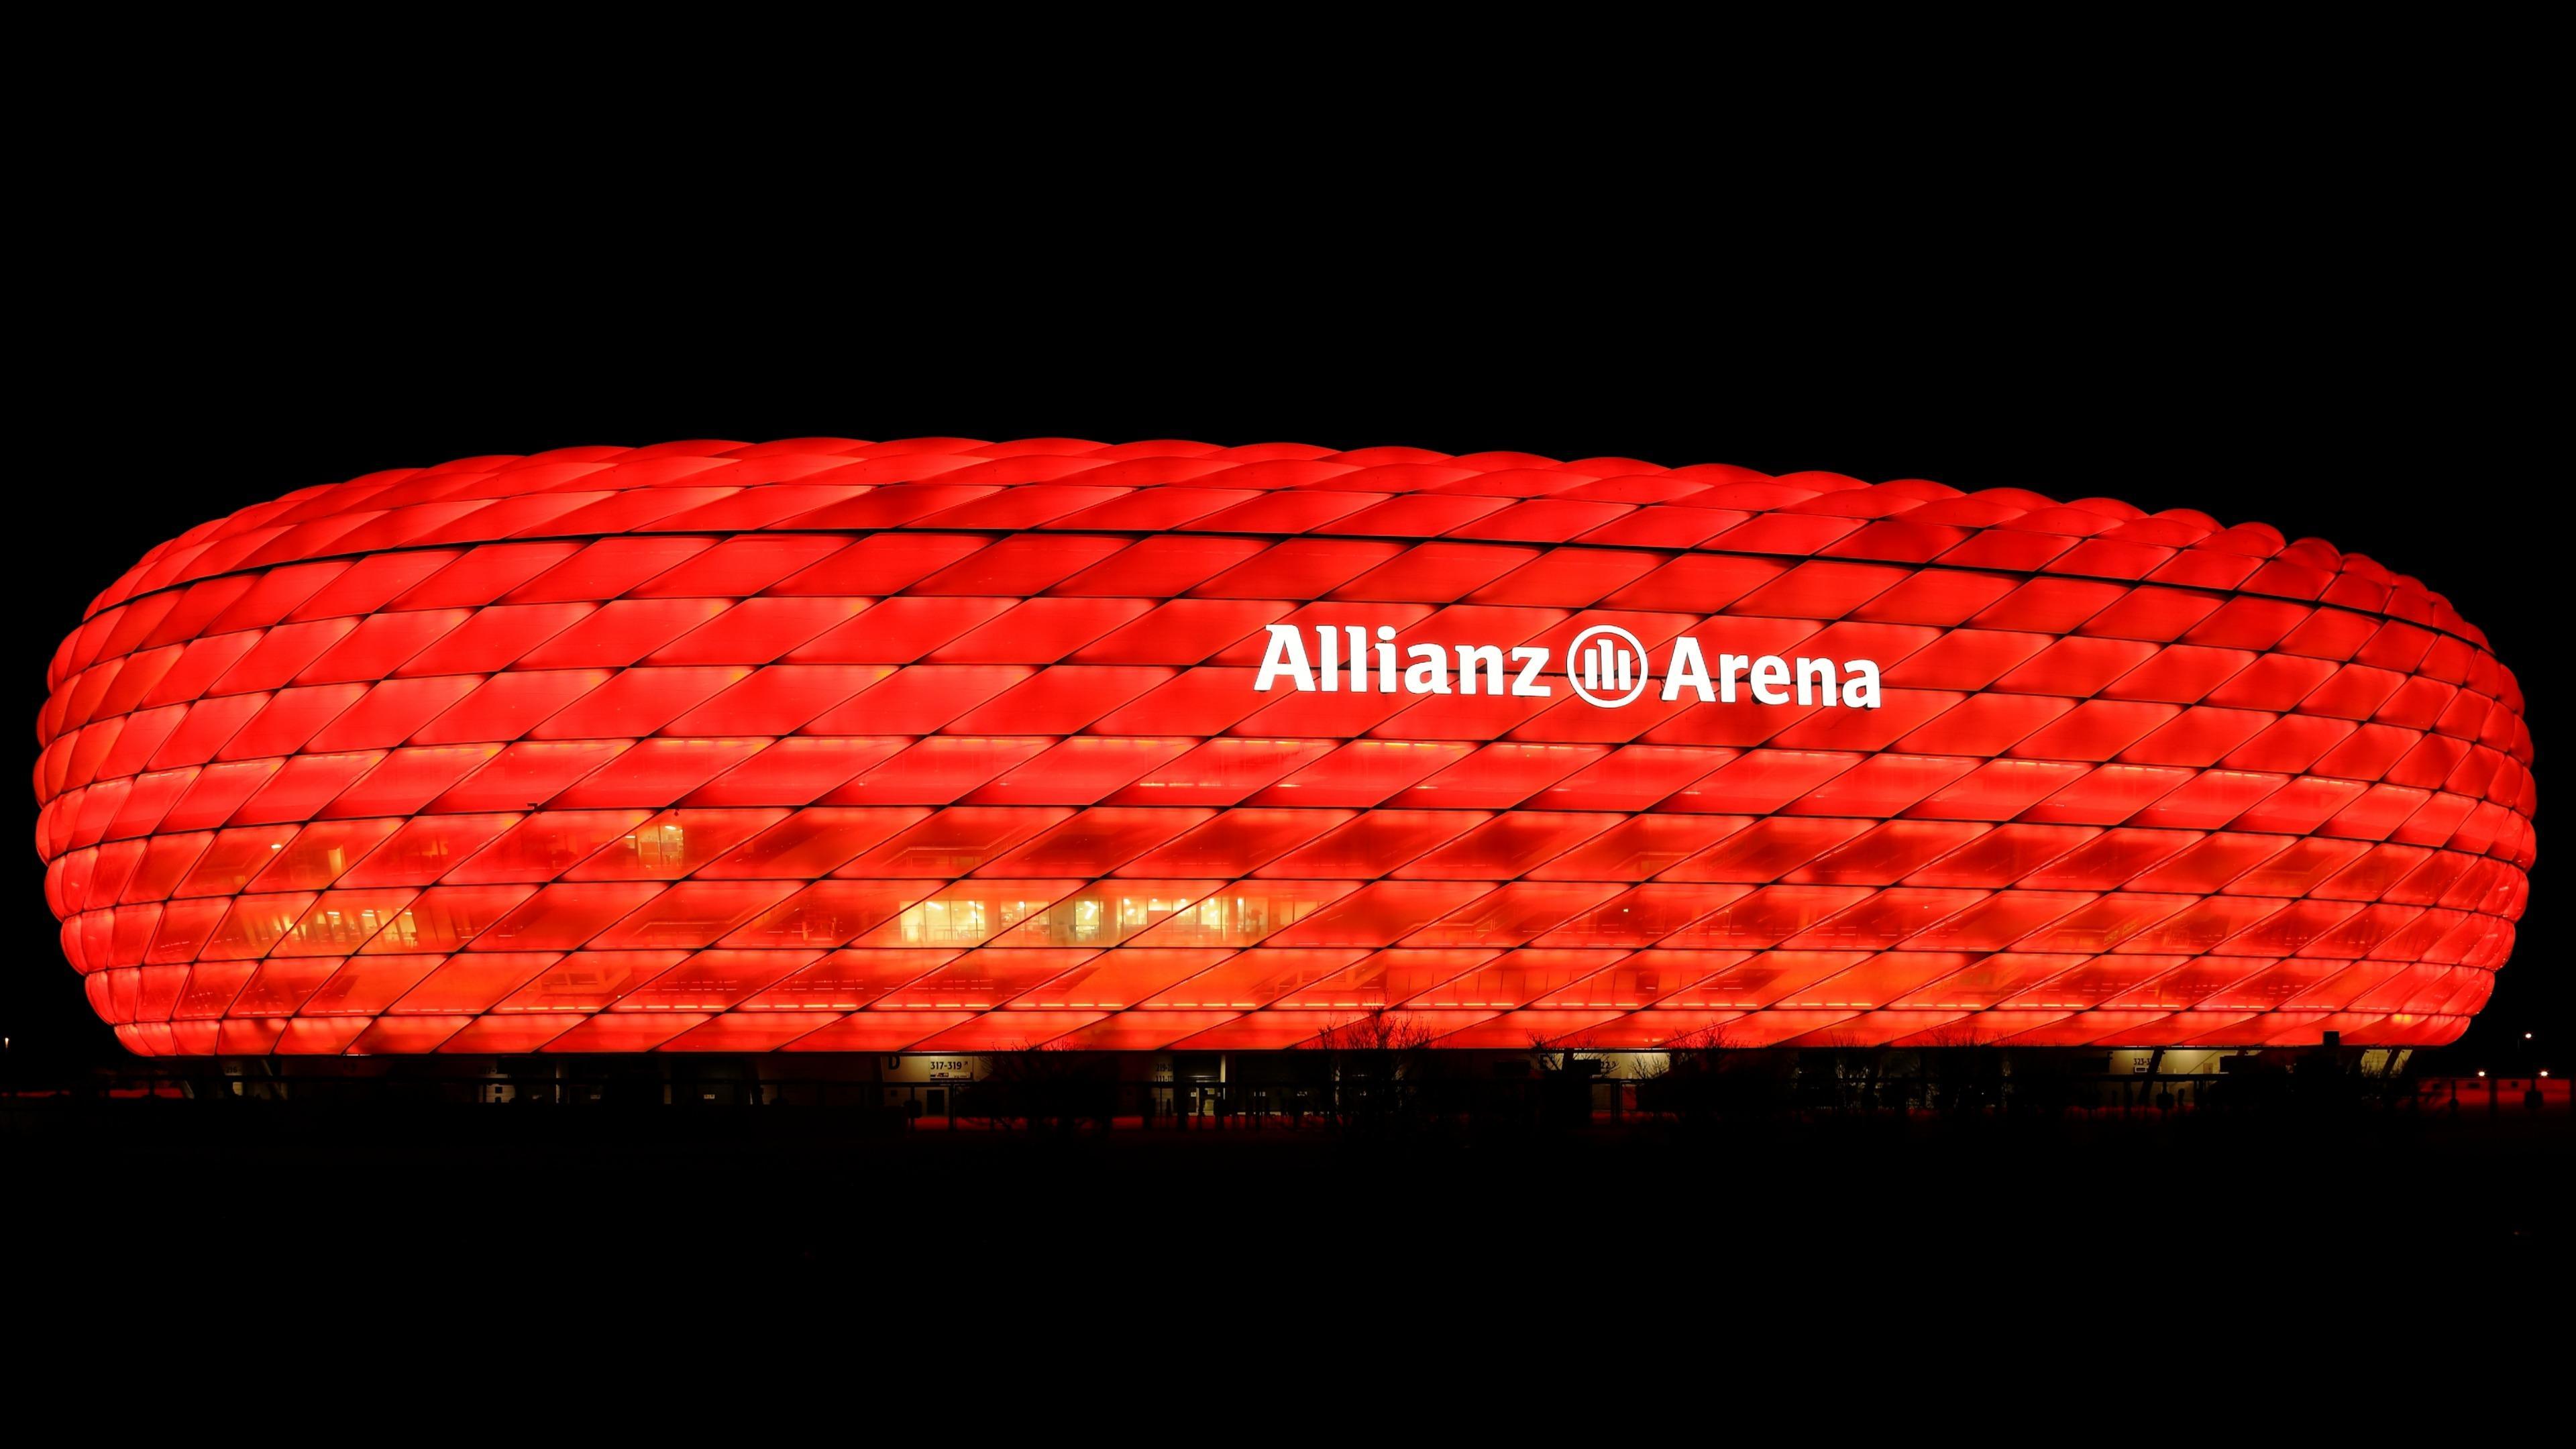 Allianz Arena Red Illumination wallpaper